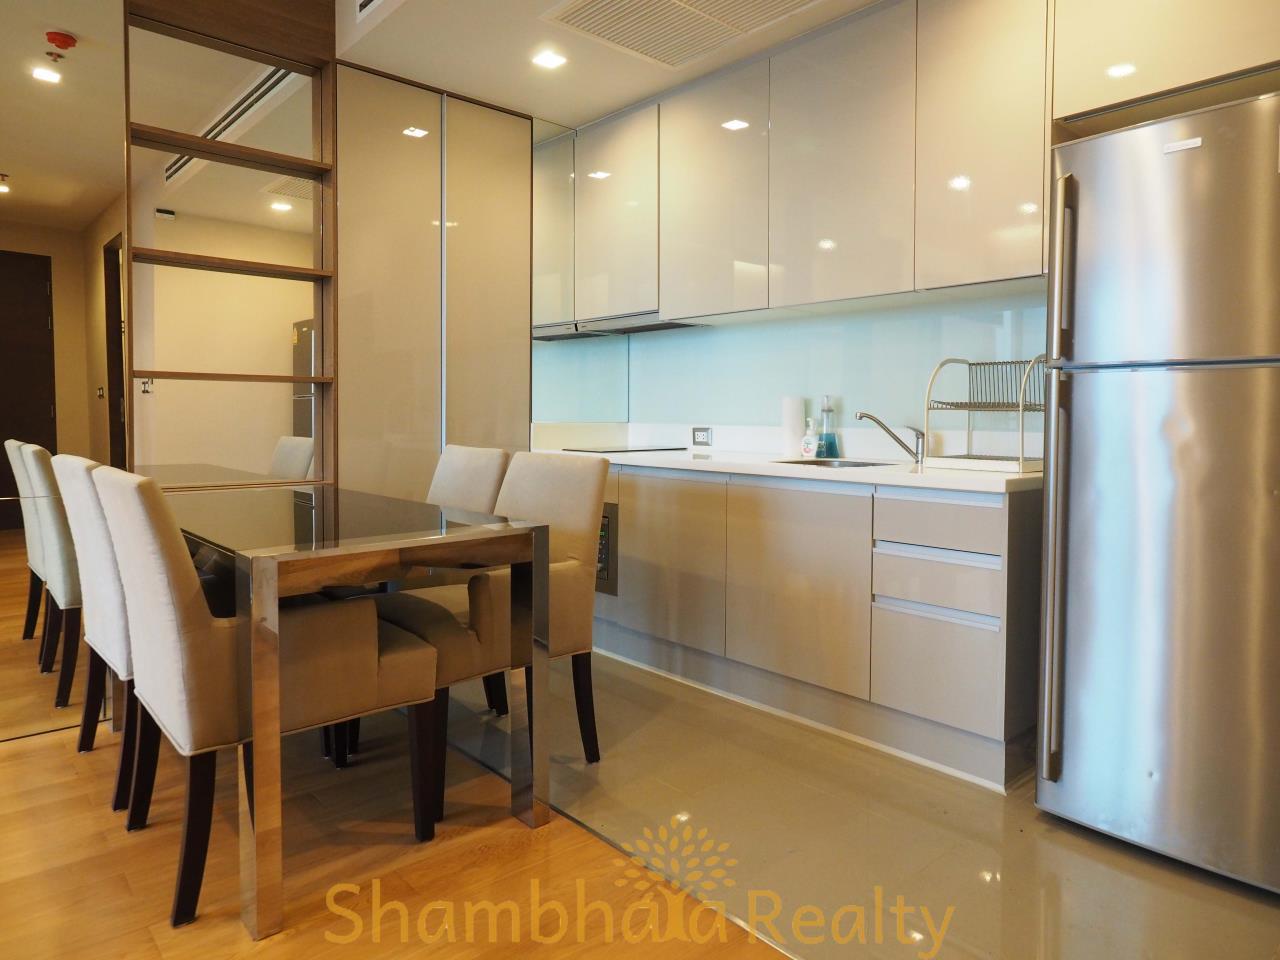 Shambhala Realty Agency's The Address Asoke Condominium for Rent in Petchaburi-tudmai 5